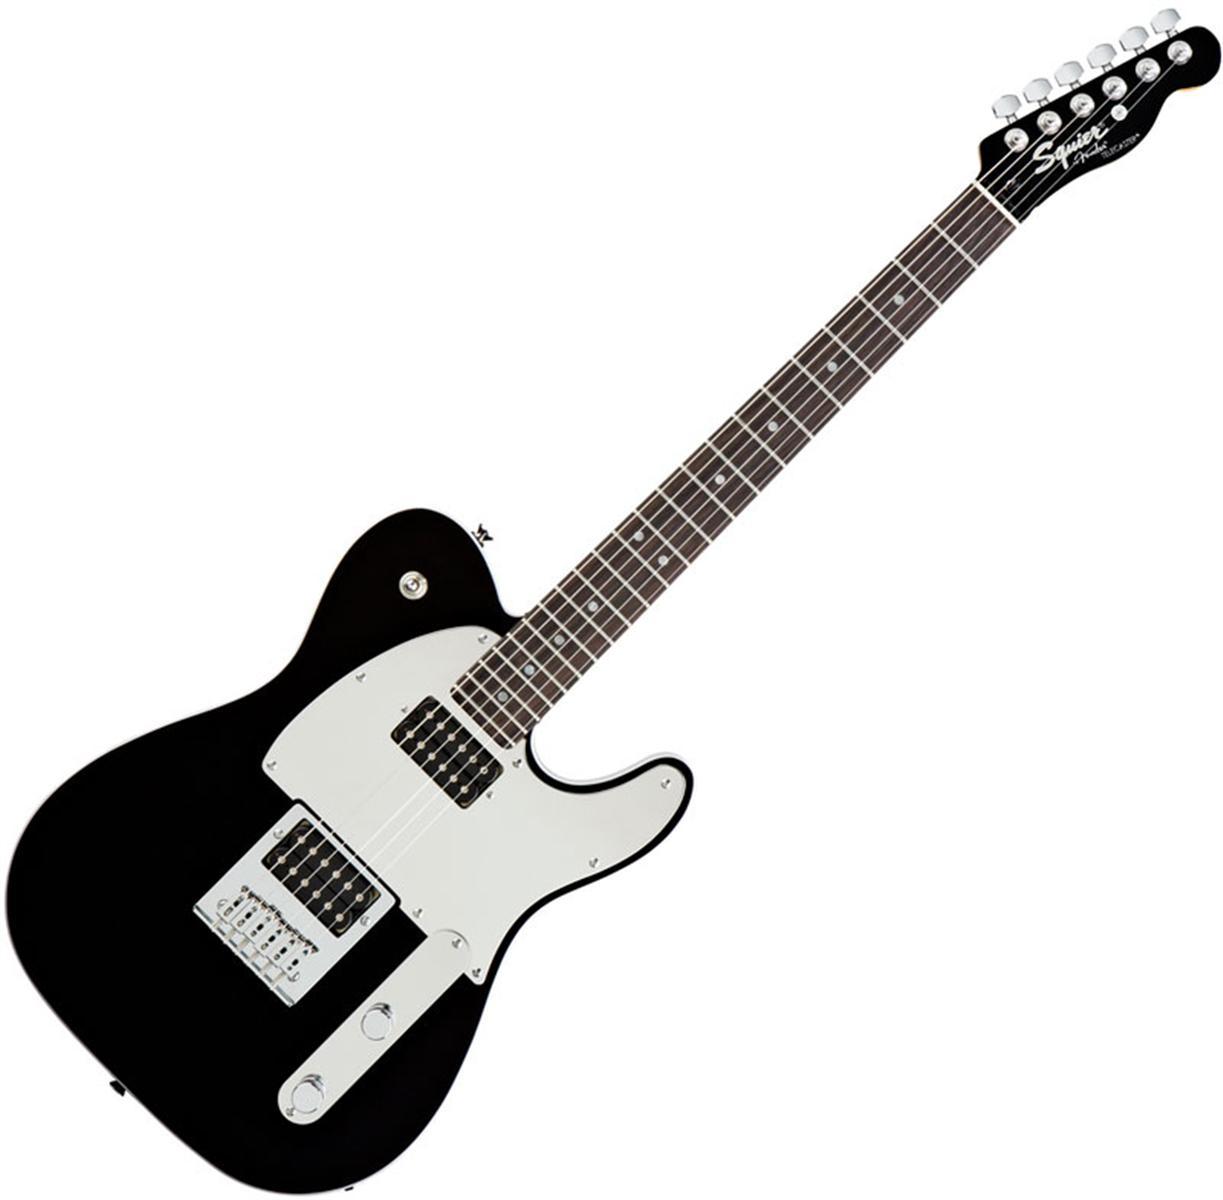 1223x1200 Black Electric Guitar Clip Art Free Clipart Images